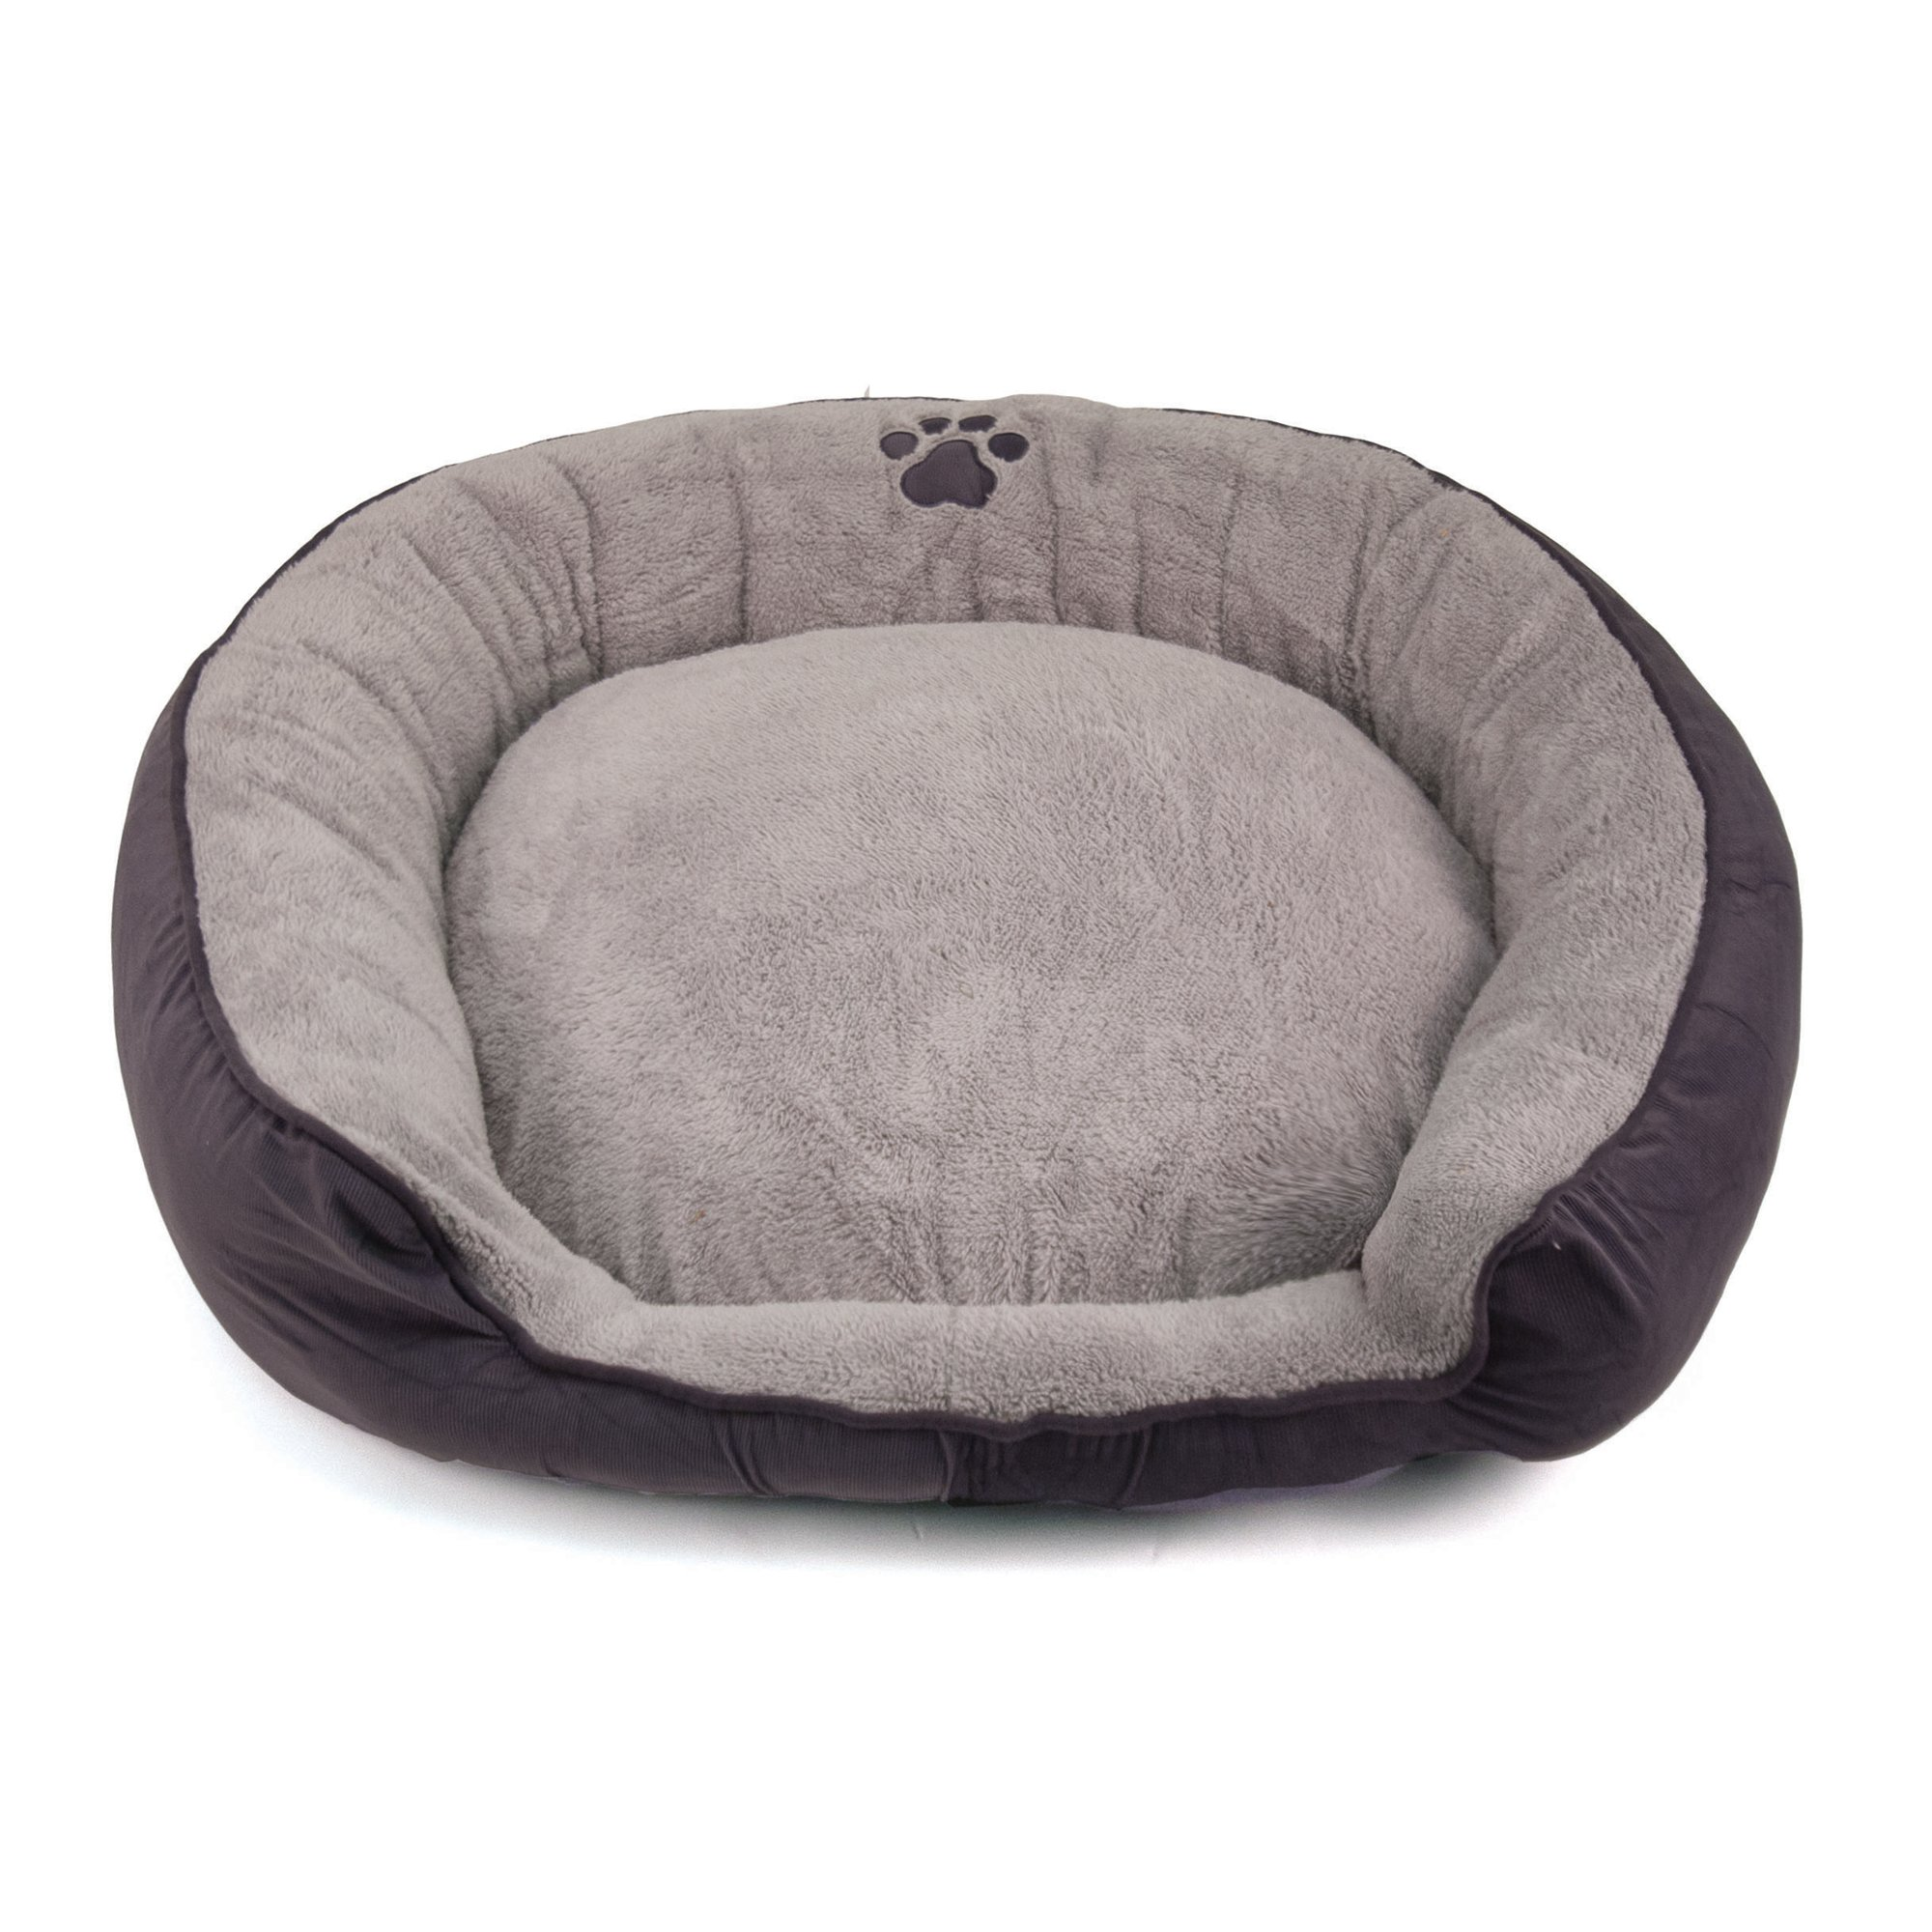 Dallas Manufacturing Purple Round Stepover Pet Bed